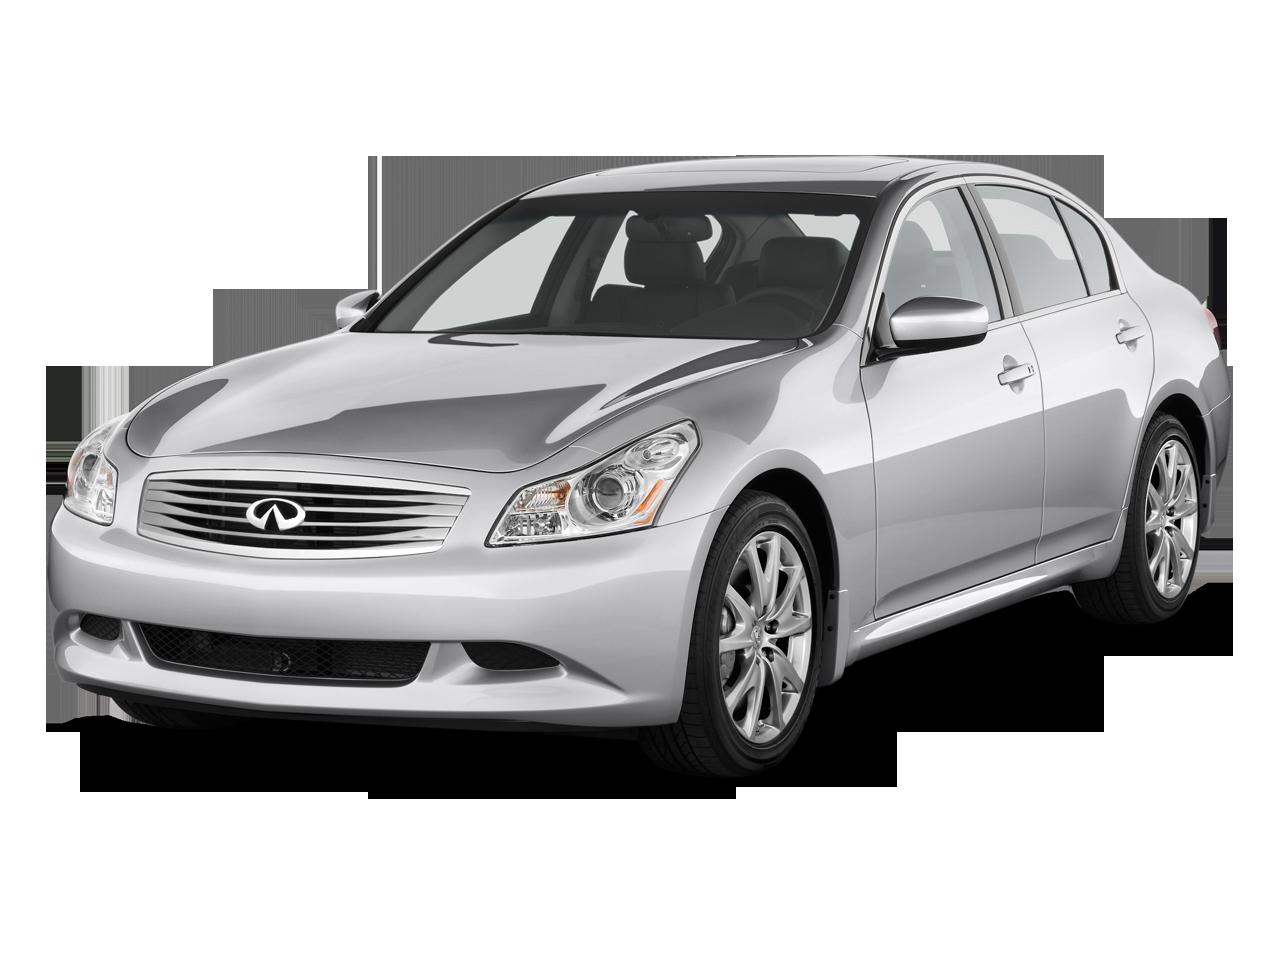 G37 Sedan 0 60 >> G37 Coupe 0 60 - 2018 - 2019 New Car Reviews by girlcodemovement